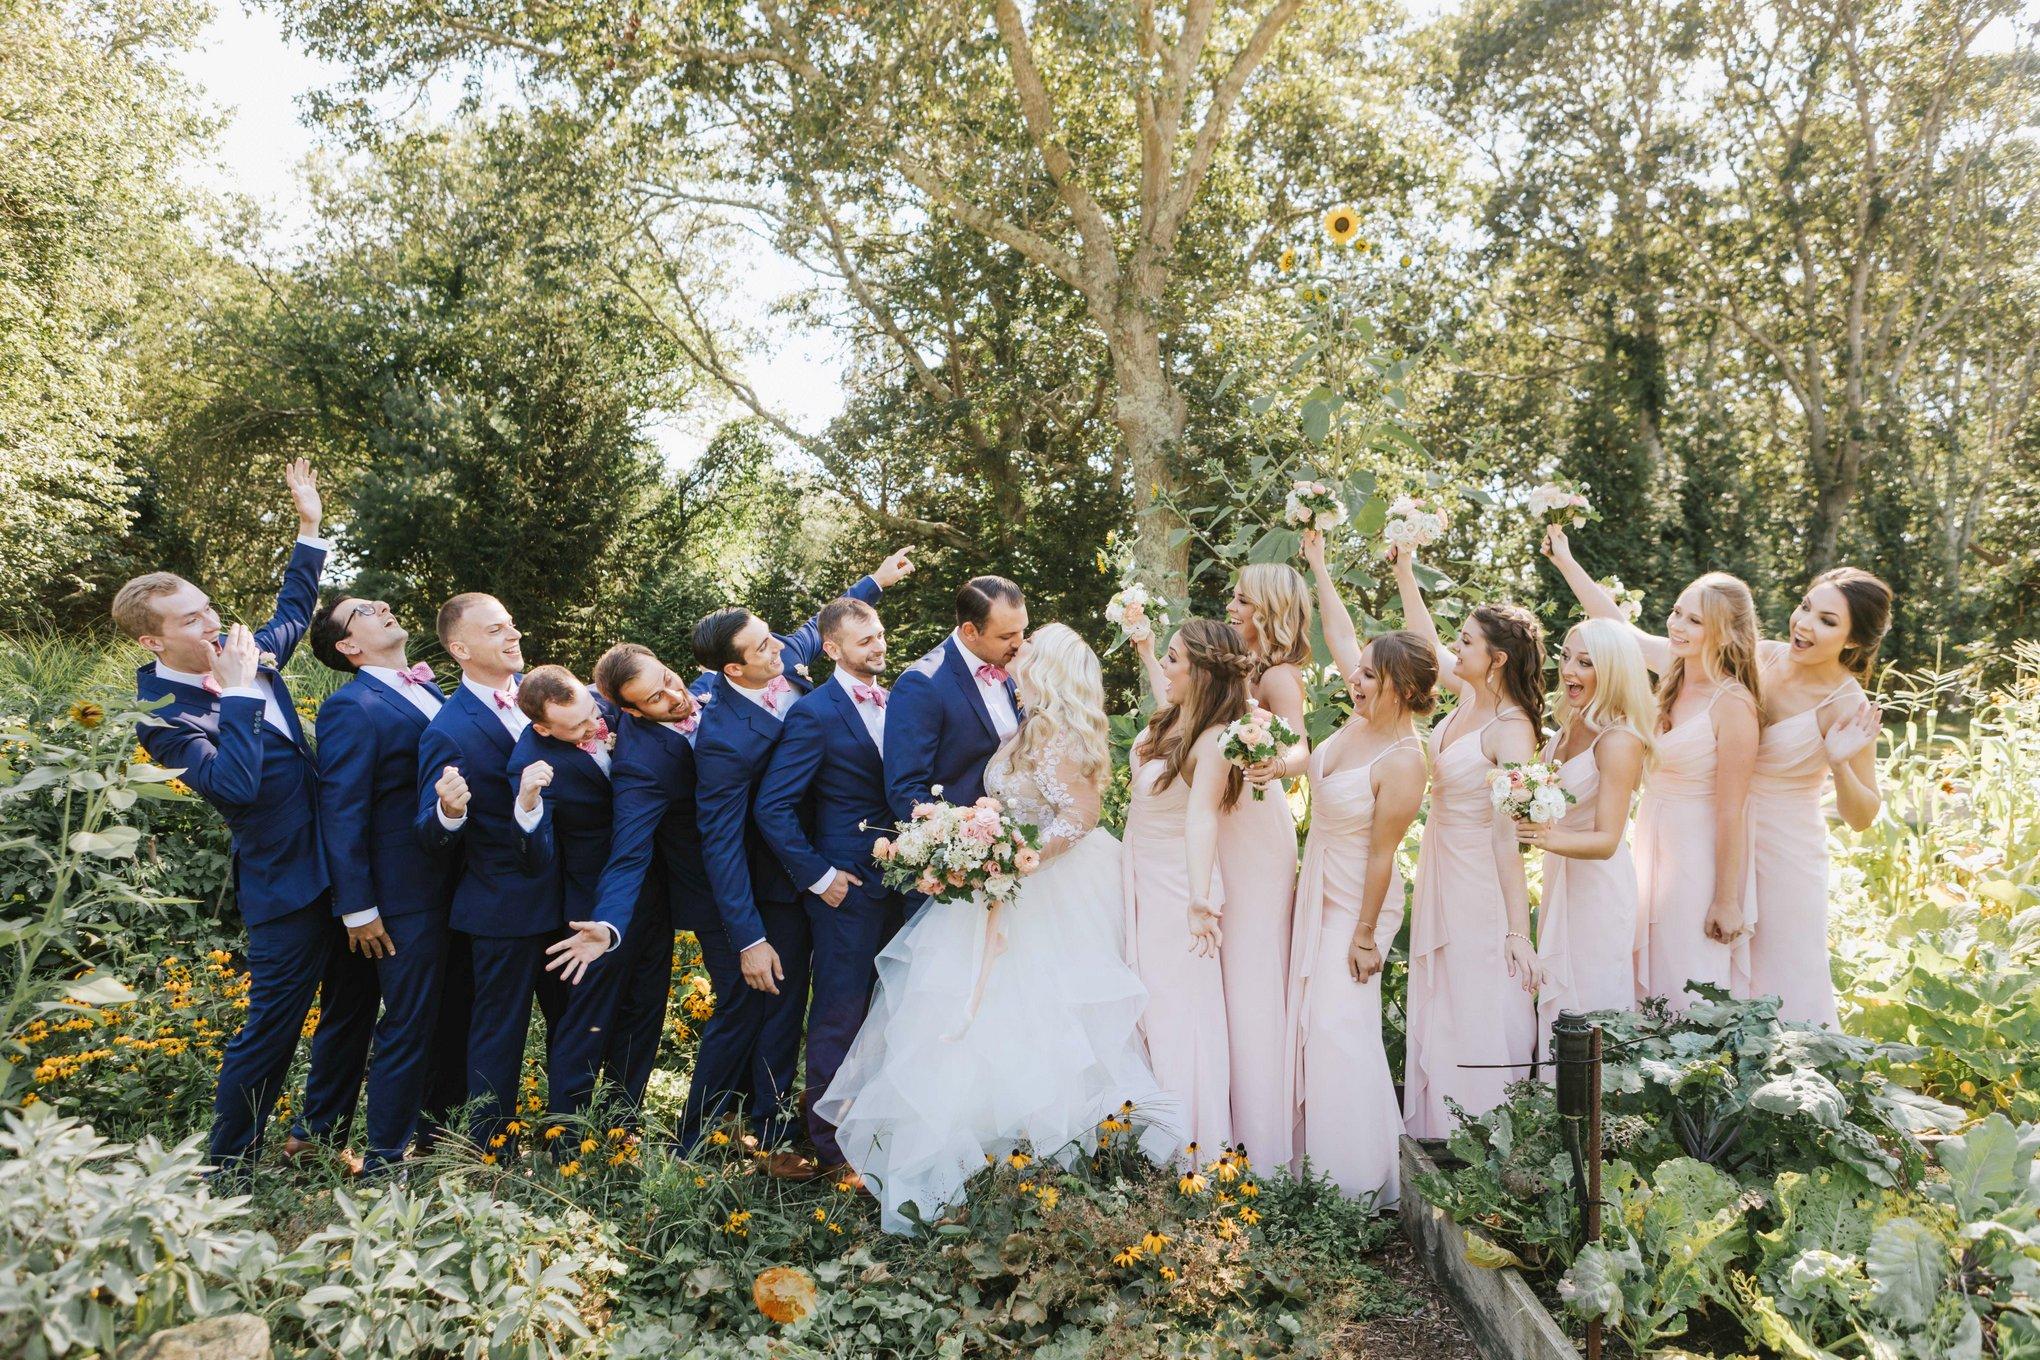 Marthas-Vineyard-Wedding-Photographer-Beach-Plum-Inn-18.jpg